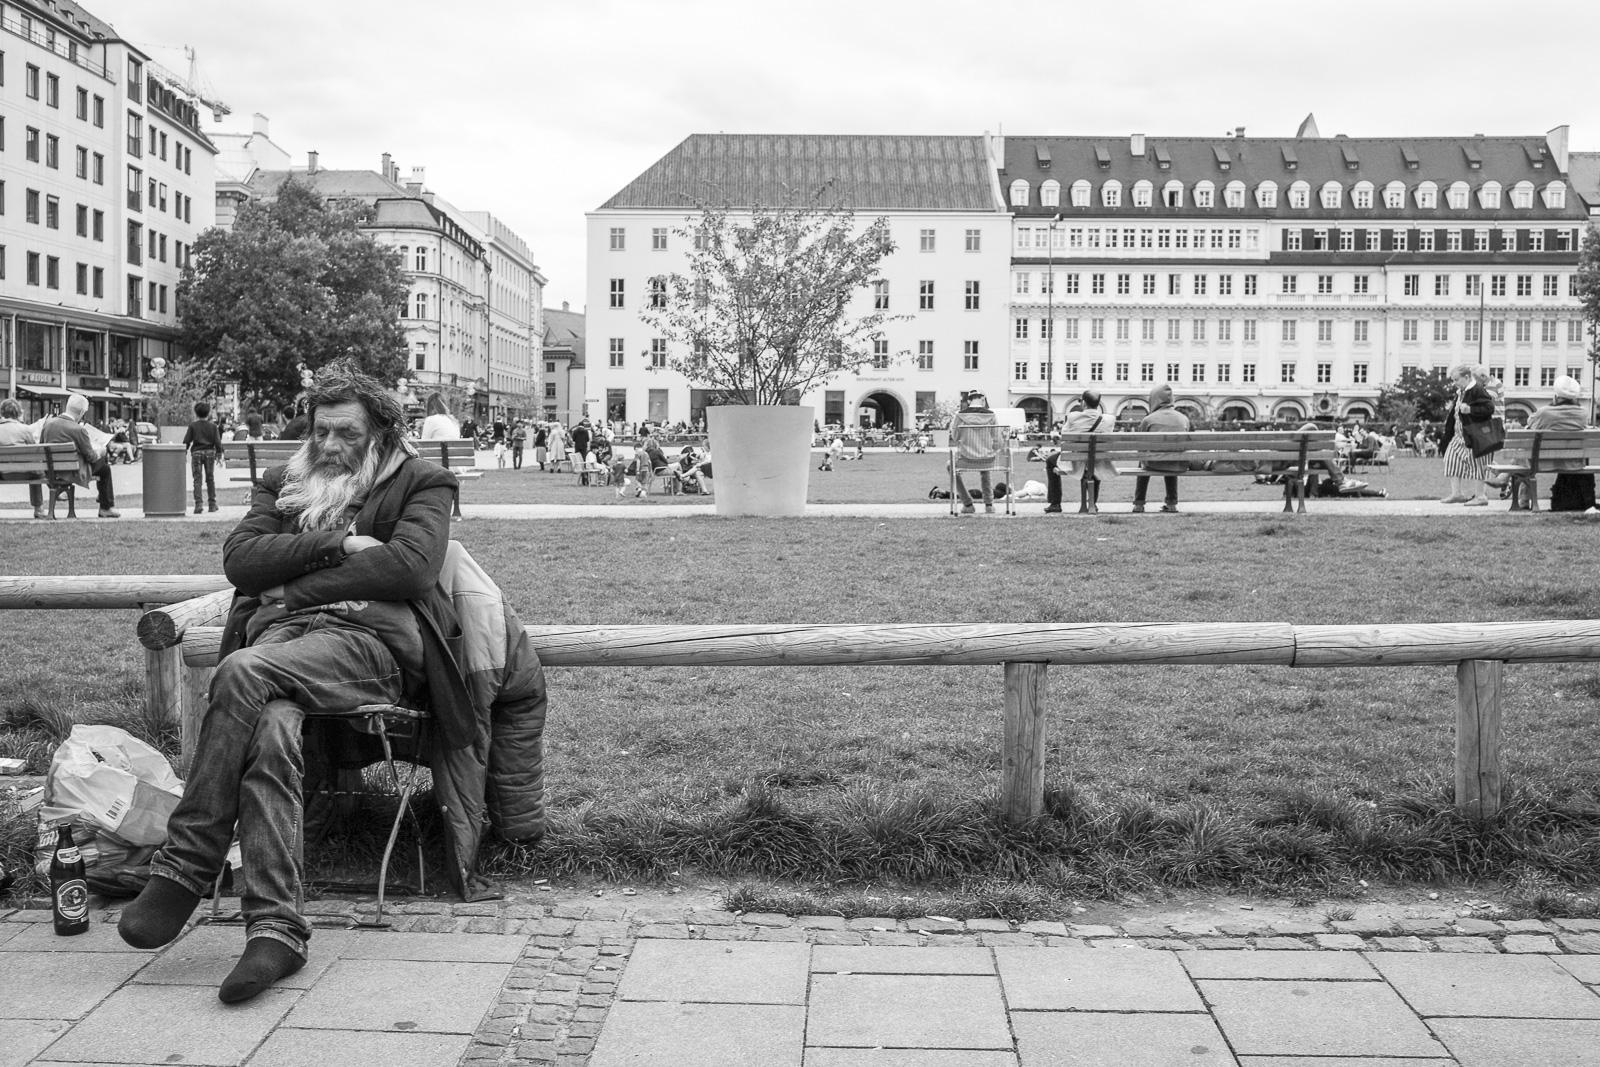 Leica M, 35 mm Summarit, f 9,5, 1/180, ISO 200